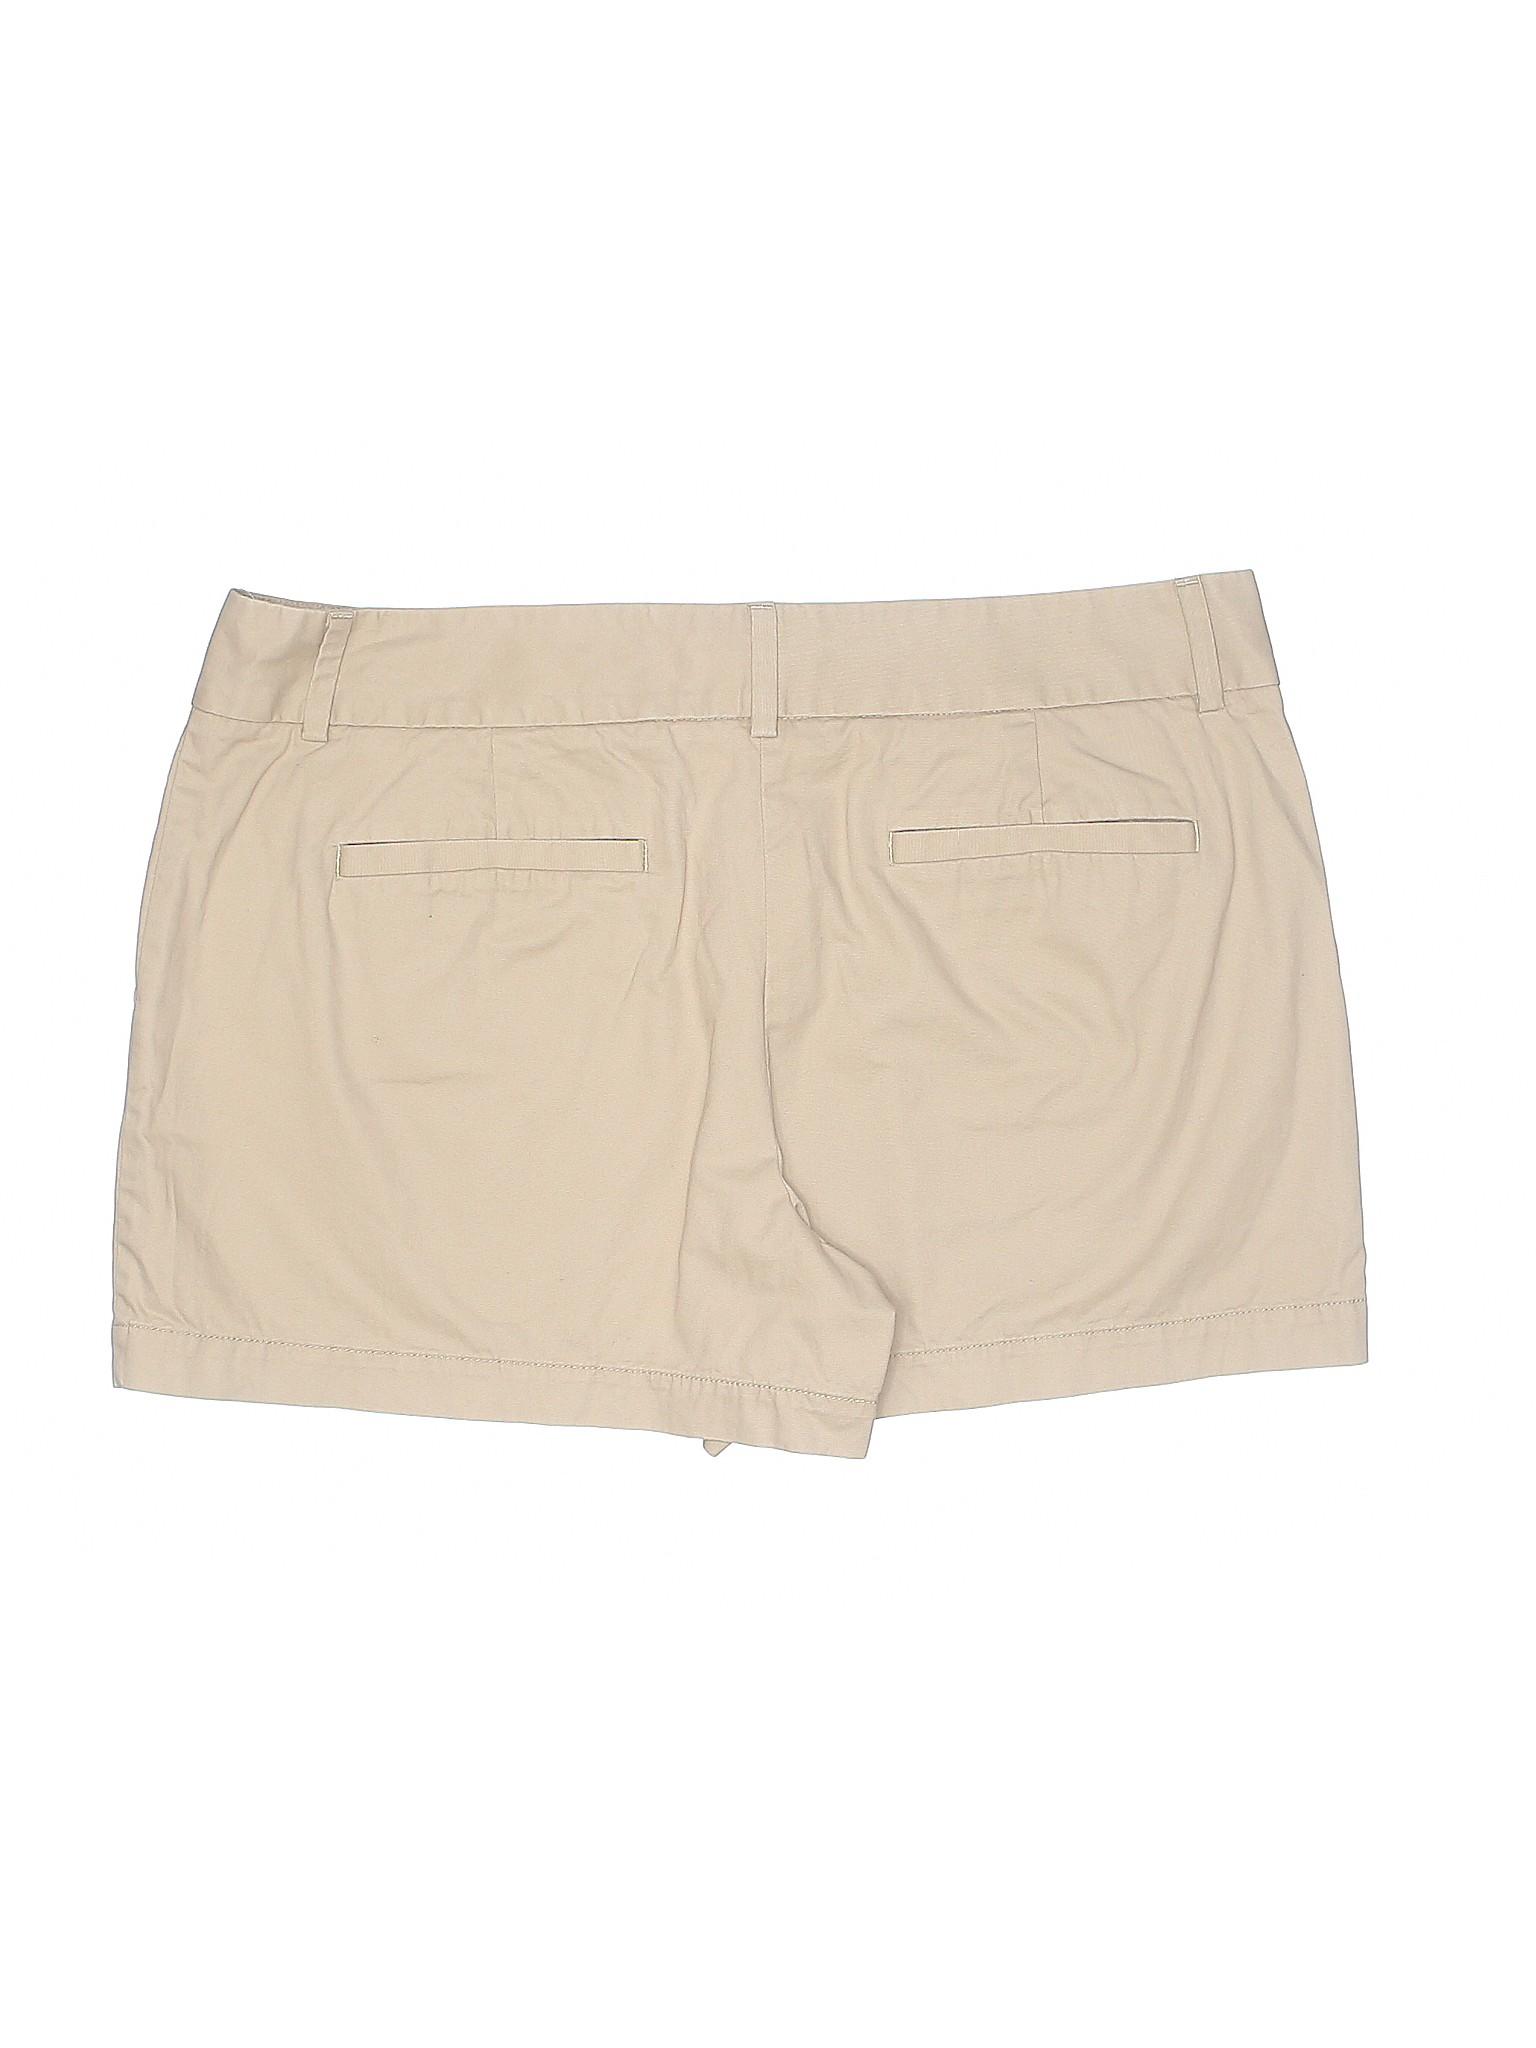 Boutique Shorts Khaki Taylor Ann LOFT rgHrq4P